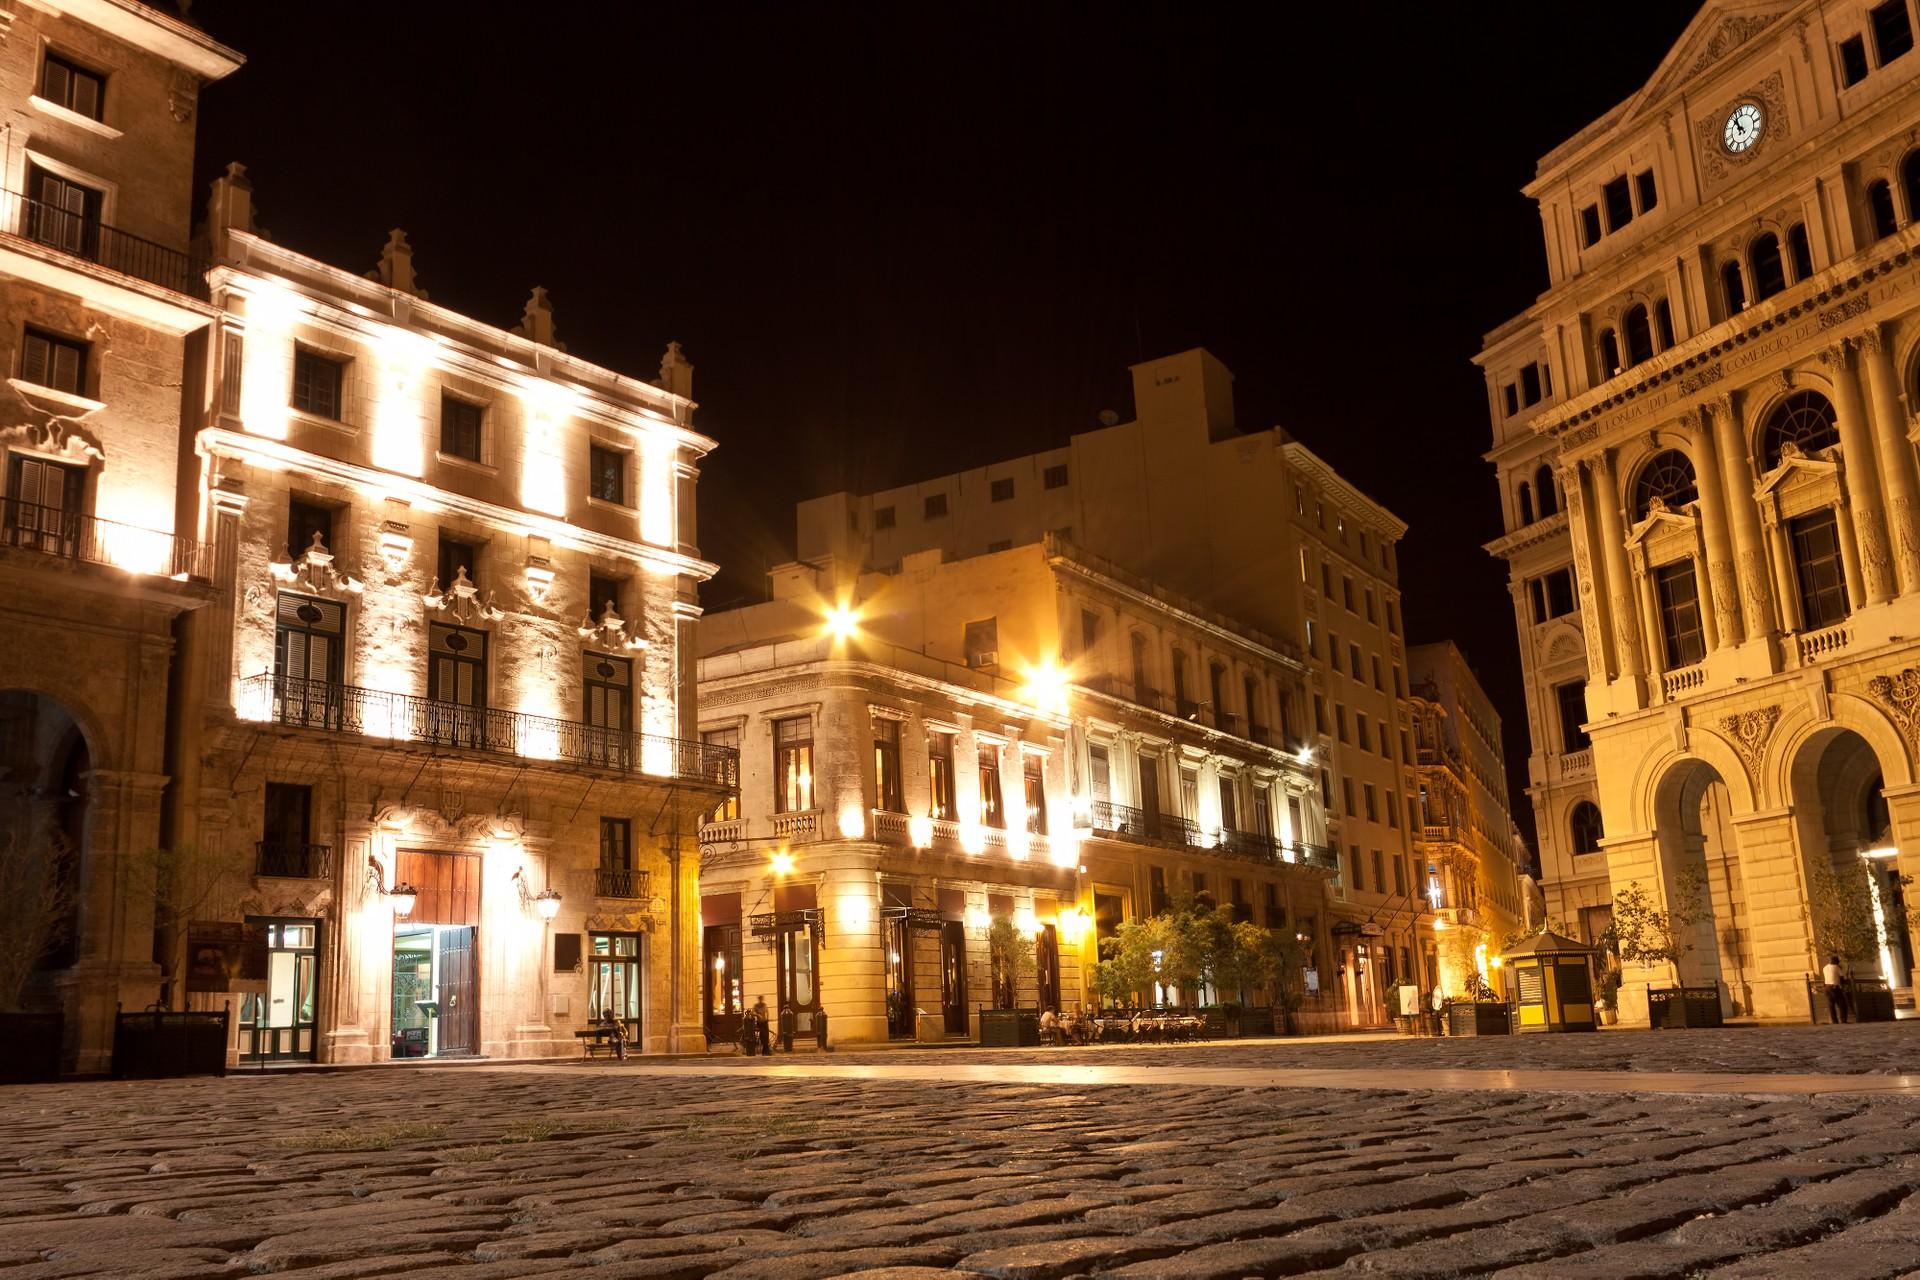 havana square at night